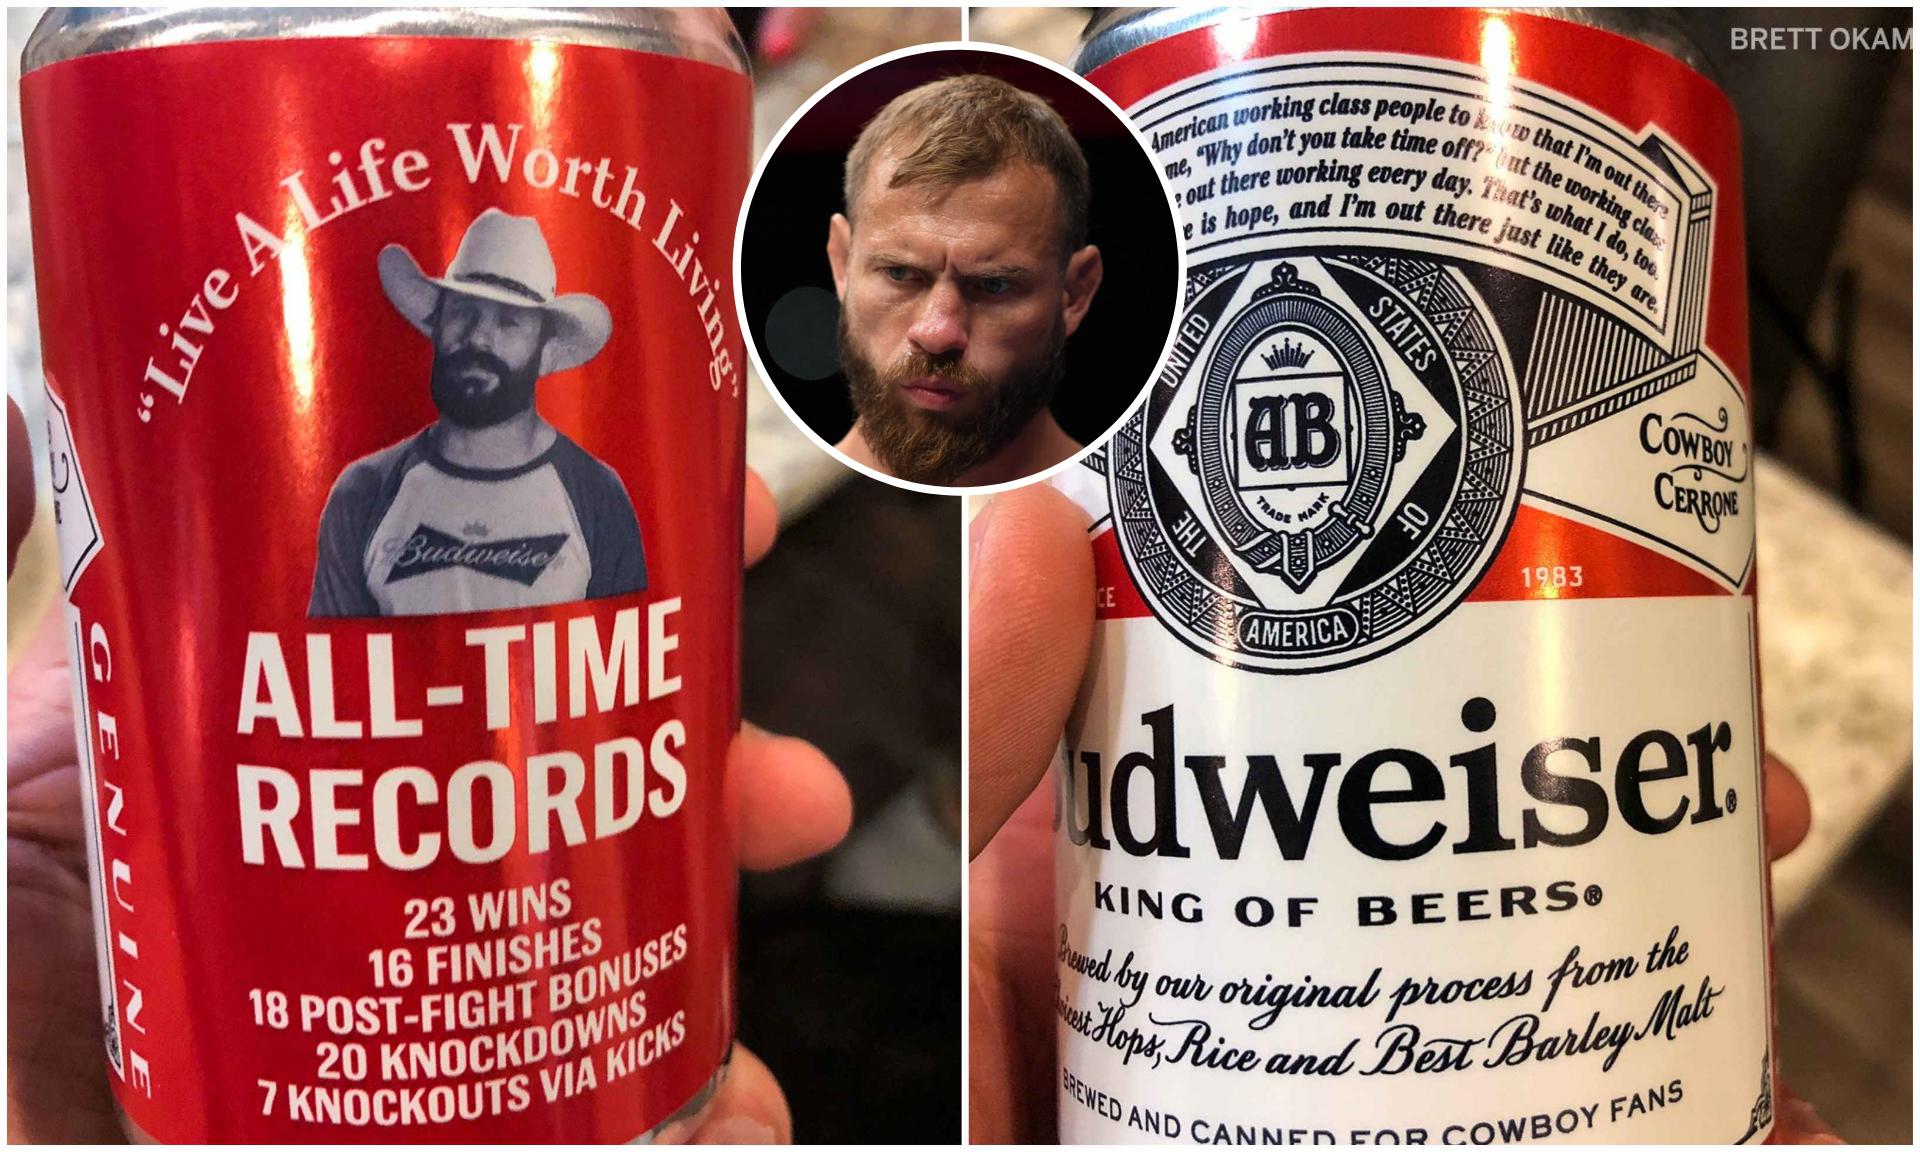 Watch: Budweiser manufactures custom 'Cowboy' beer cans ahead of UFC 246 - Budweiser